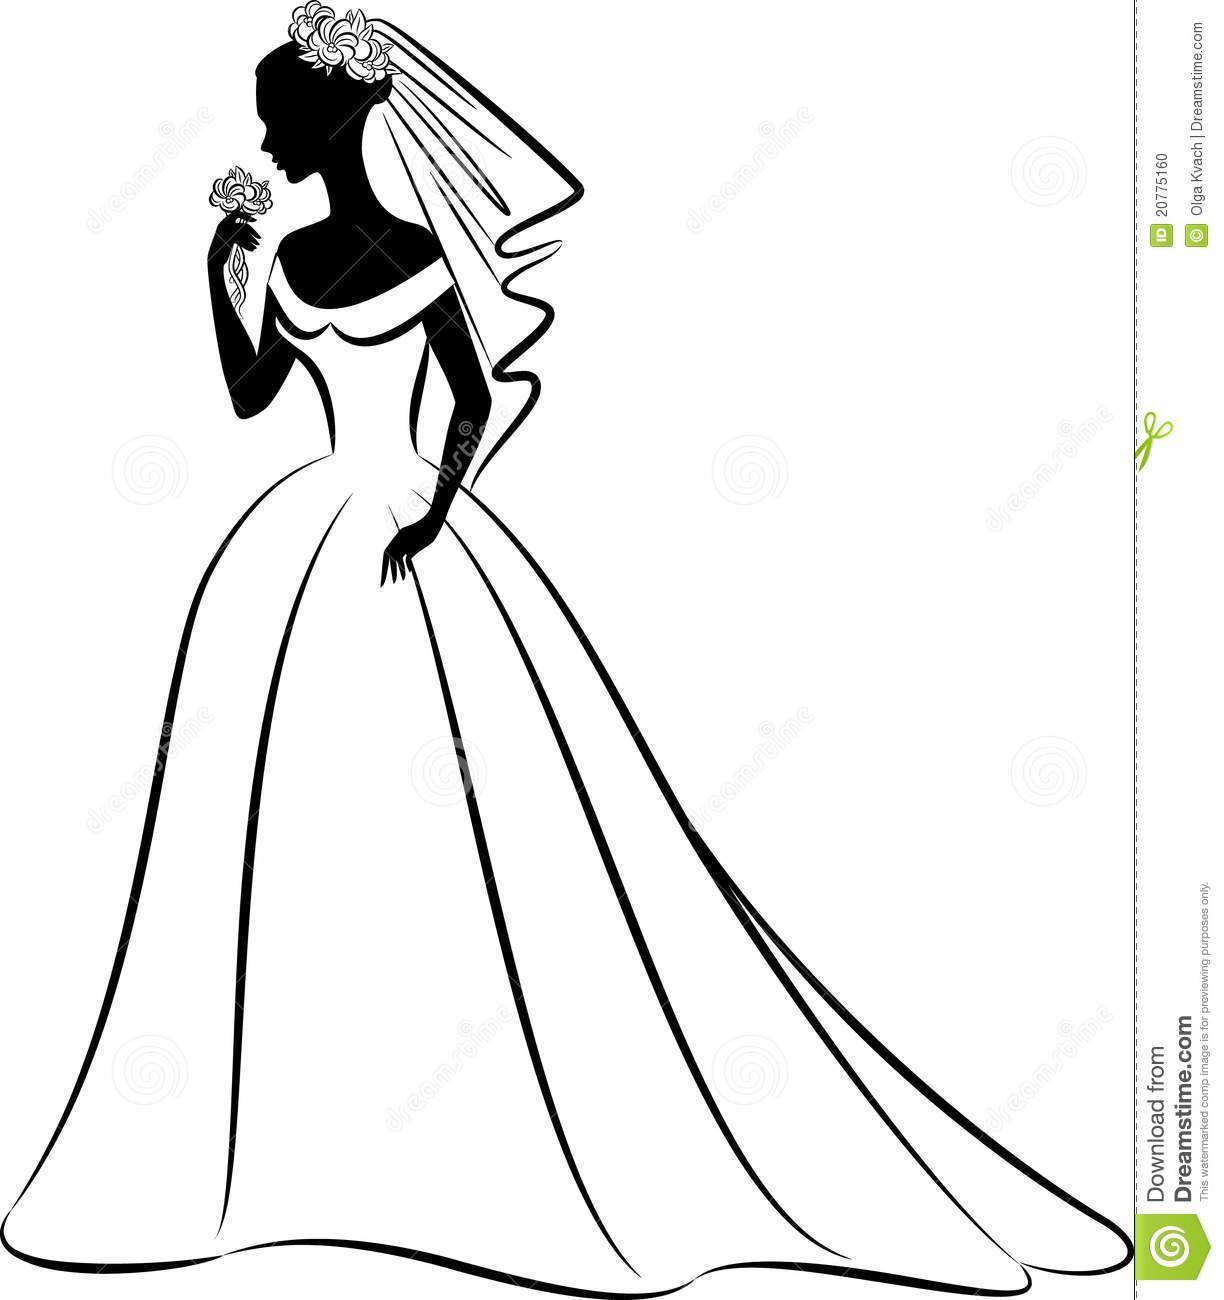 bridal clip art black and white.